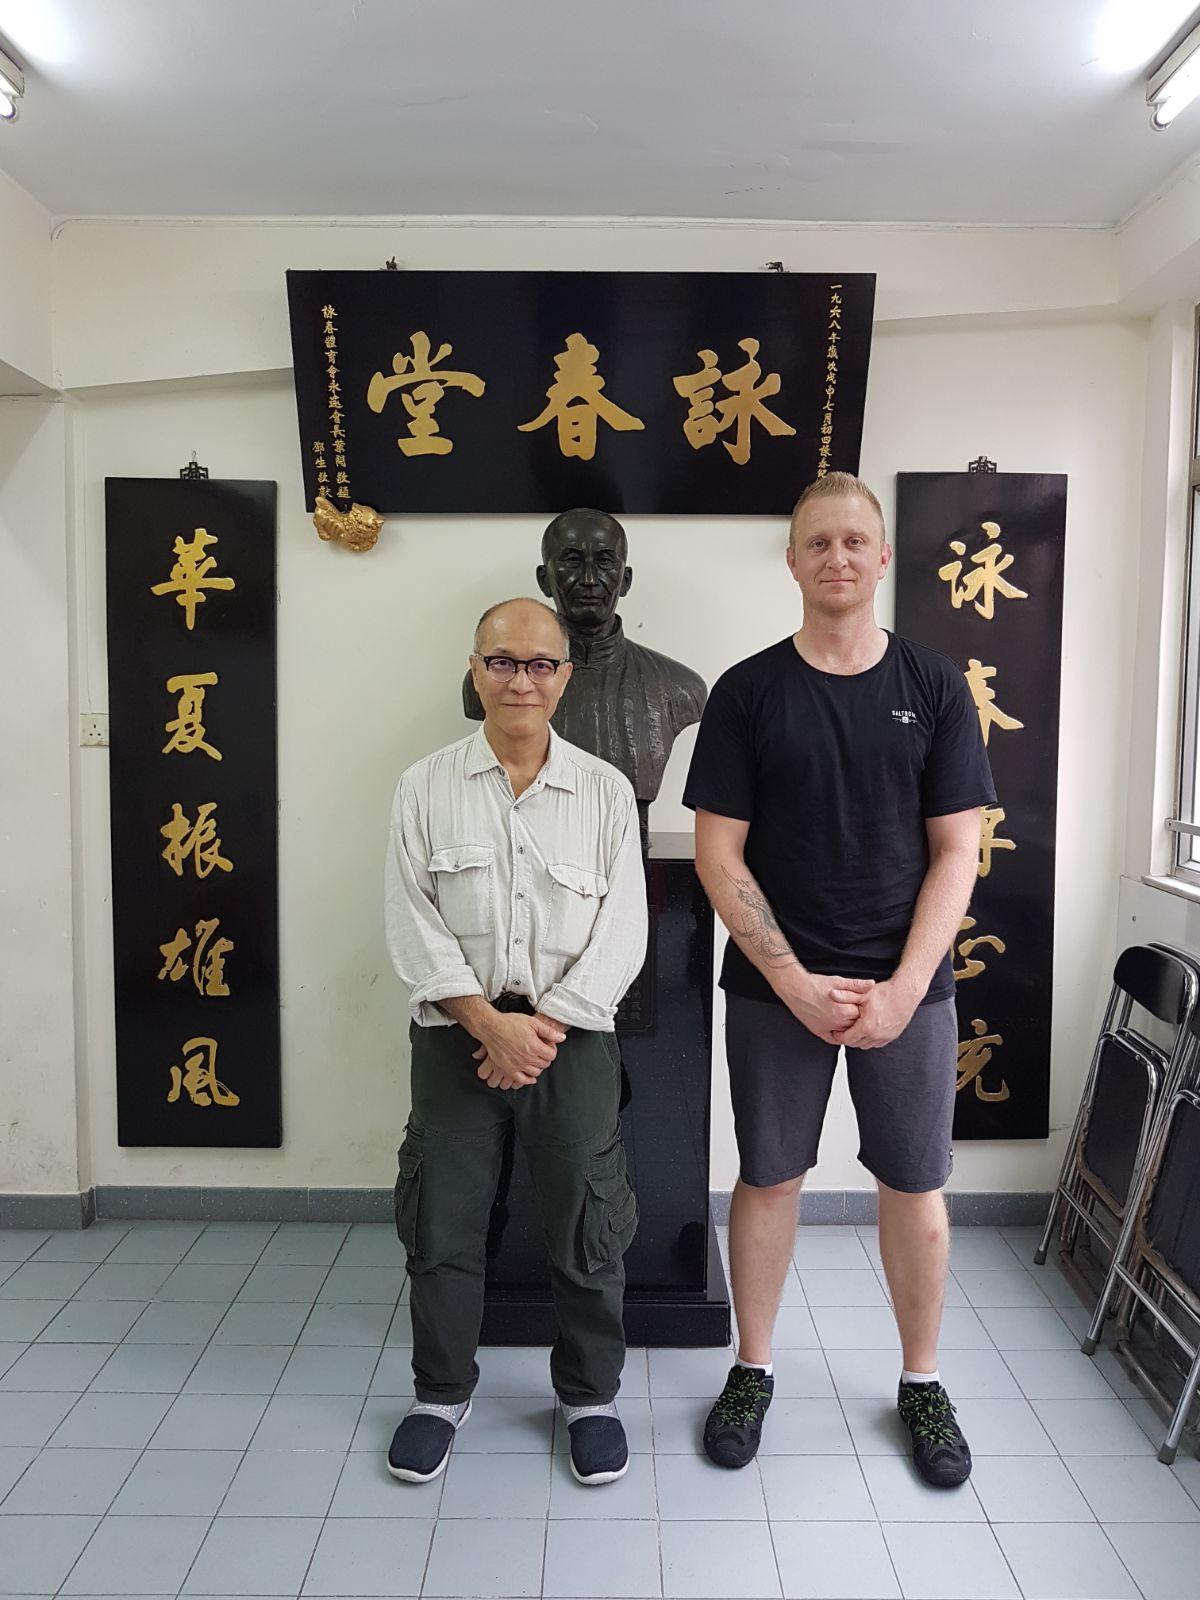 Robert Ley with his Sihing Lui Ming Fai in Hong Kong